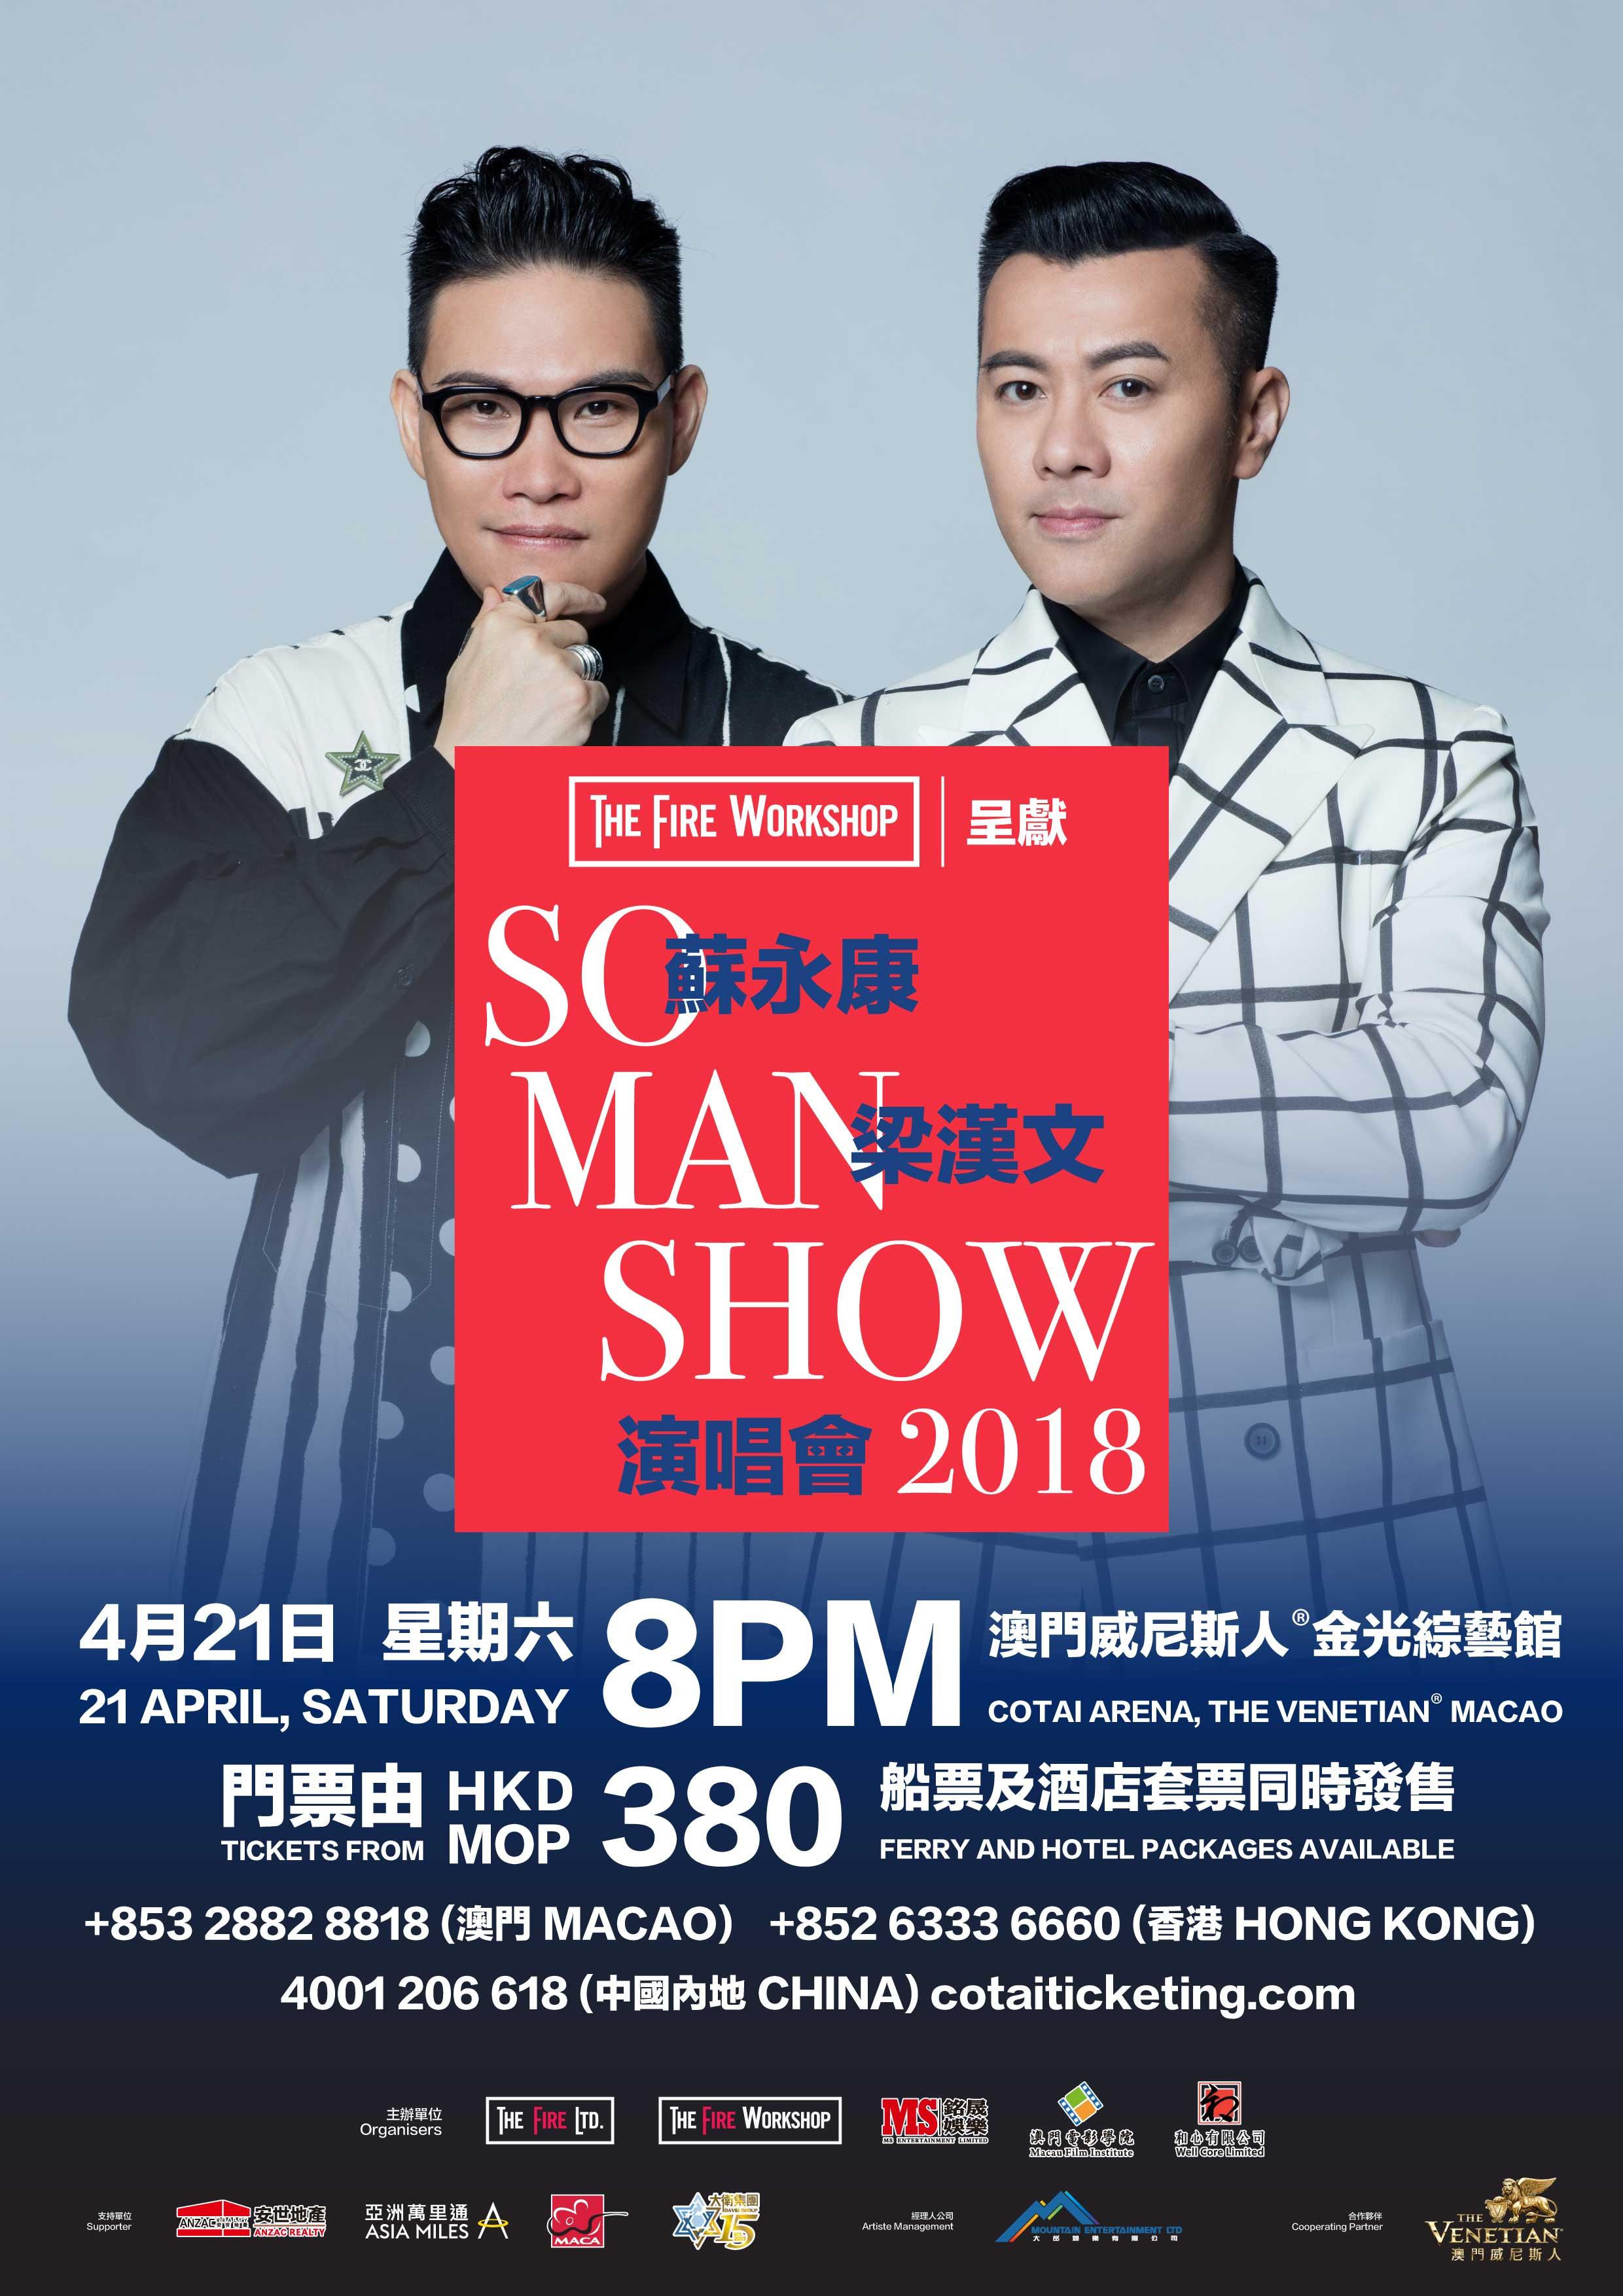 《So Man Show》- 金光澳门威尼斯人综艺馆